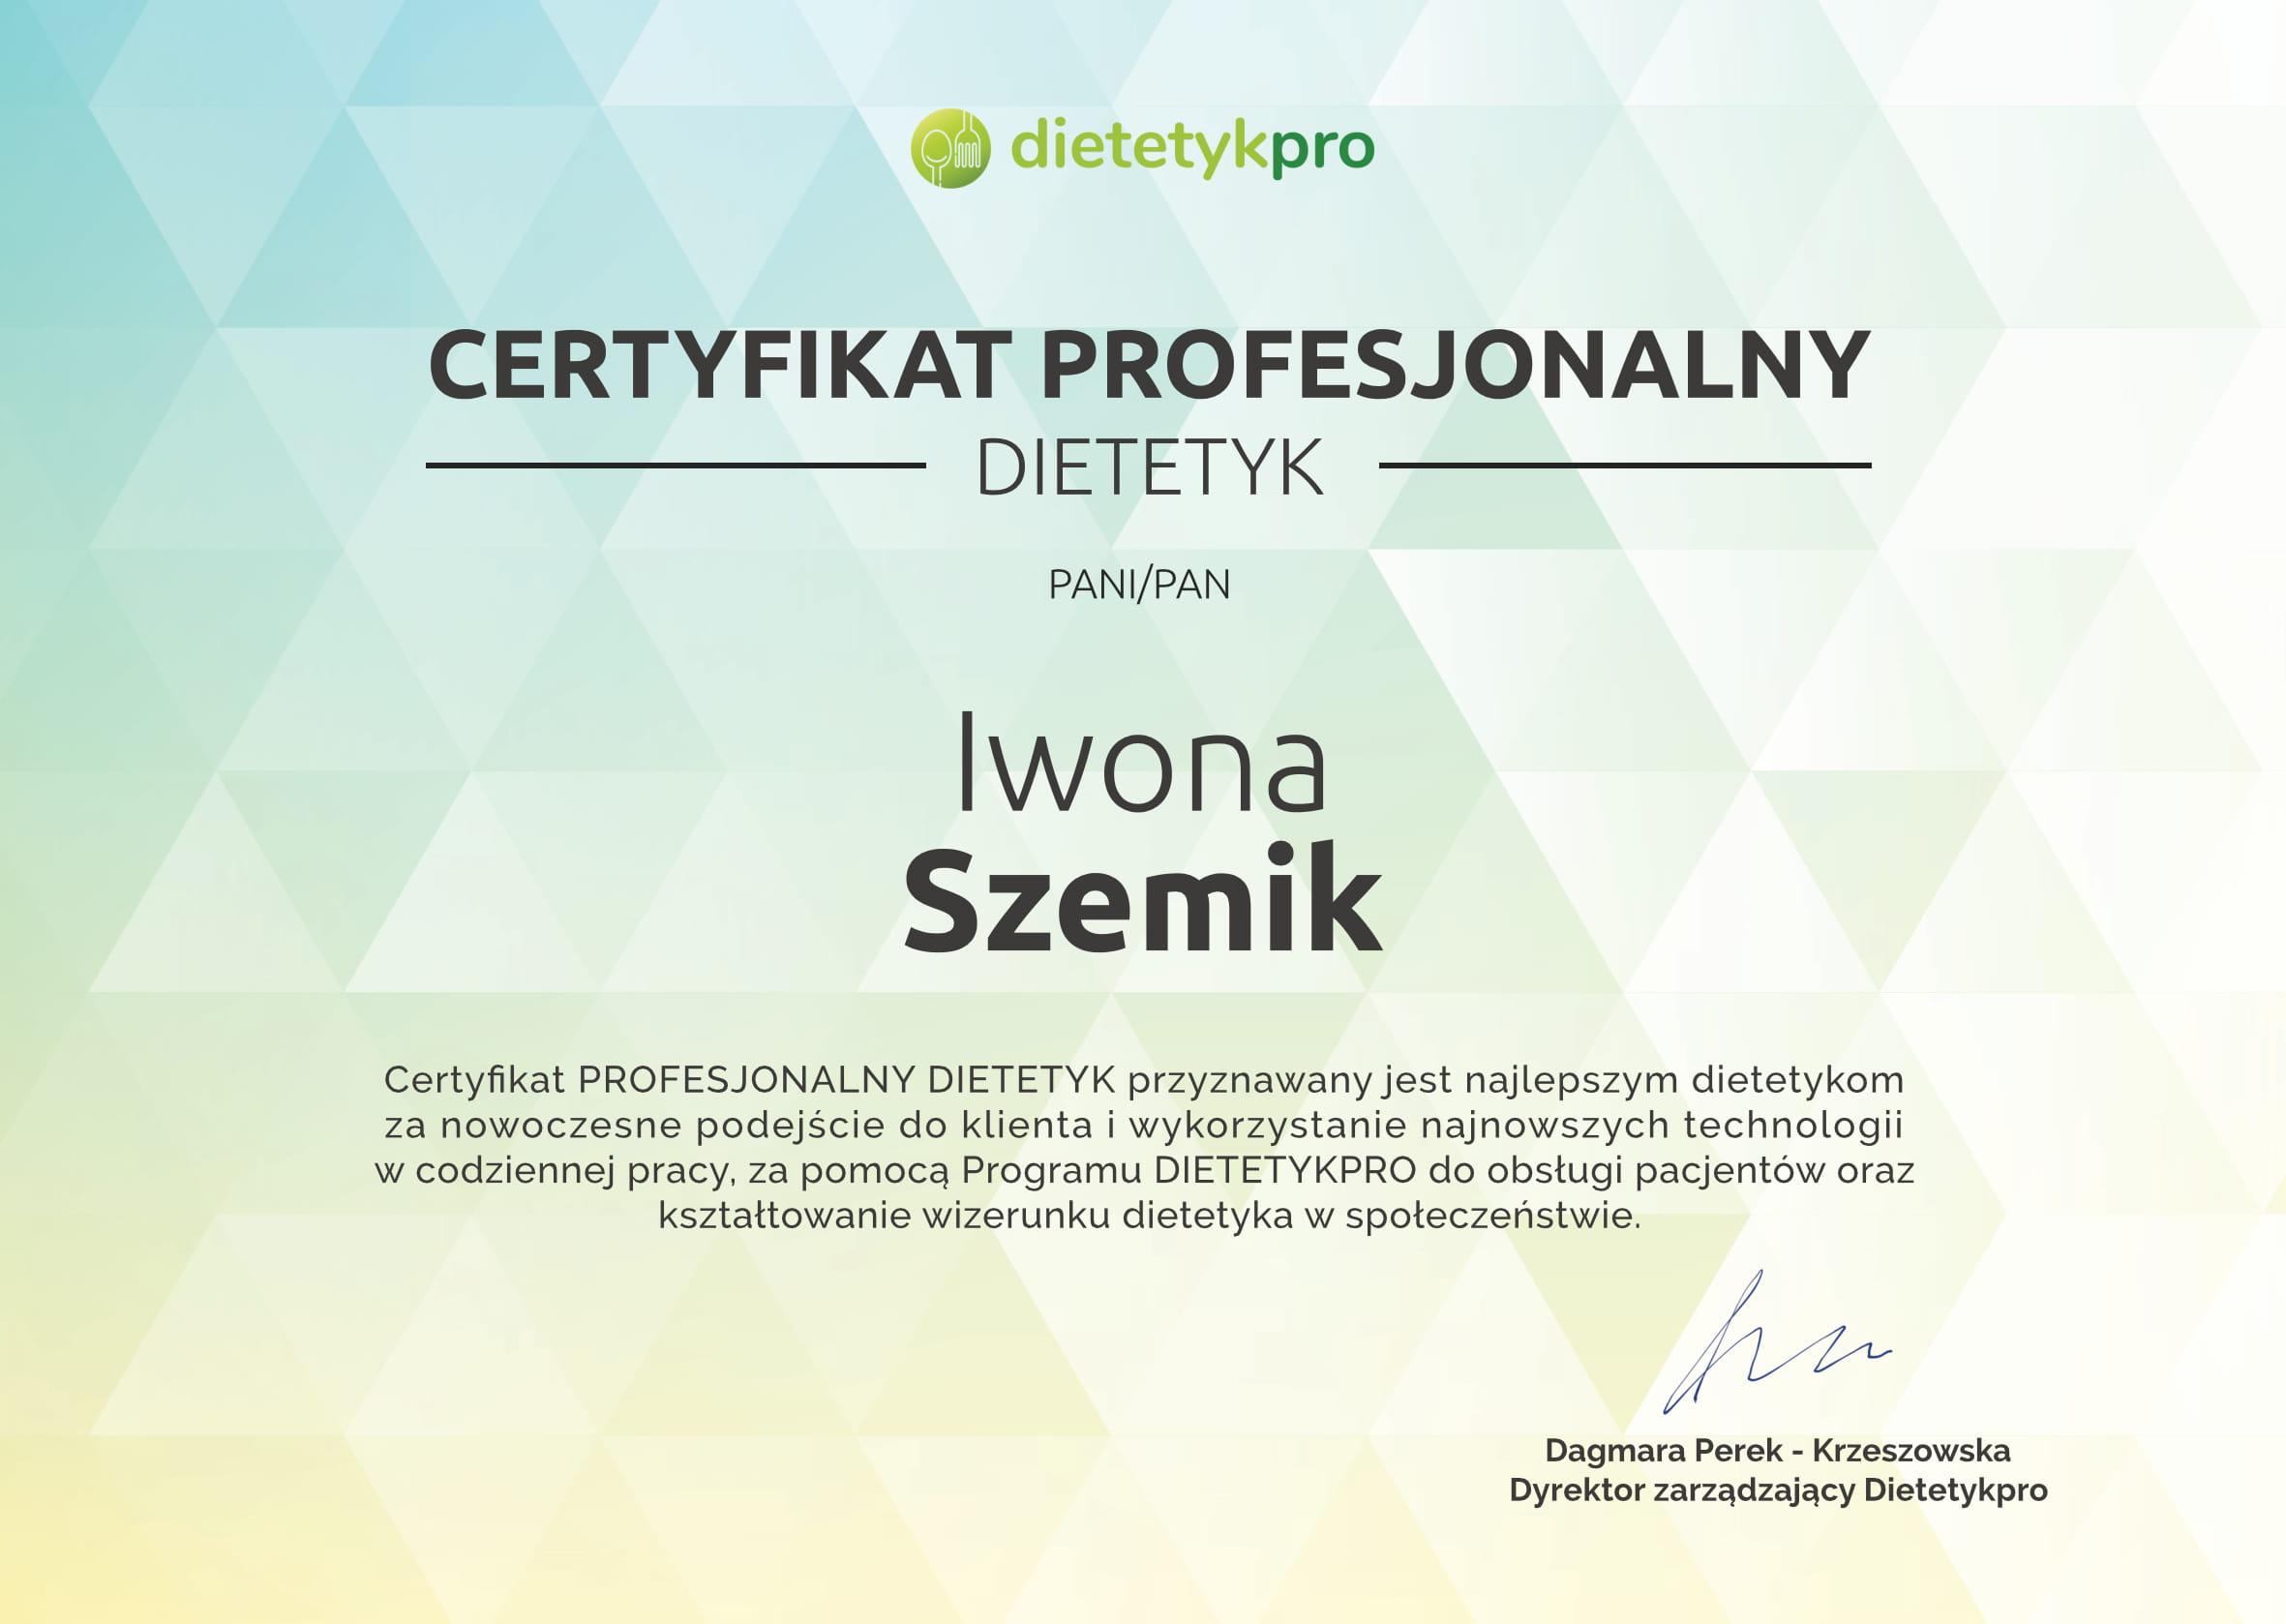 certyfikat-profesjonalny-dietetyk-iwona-szemik